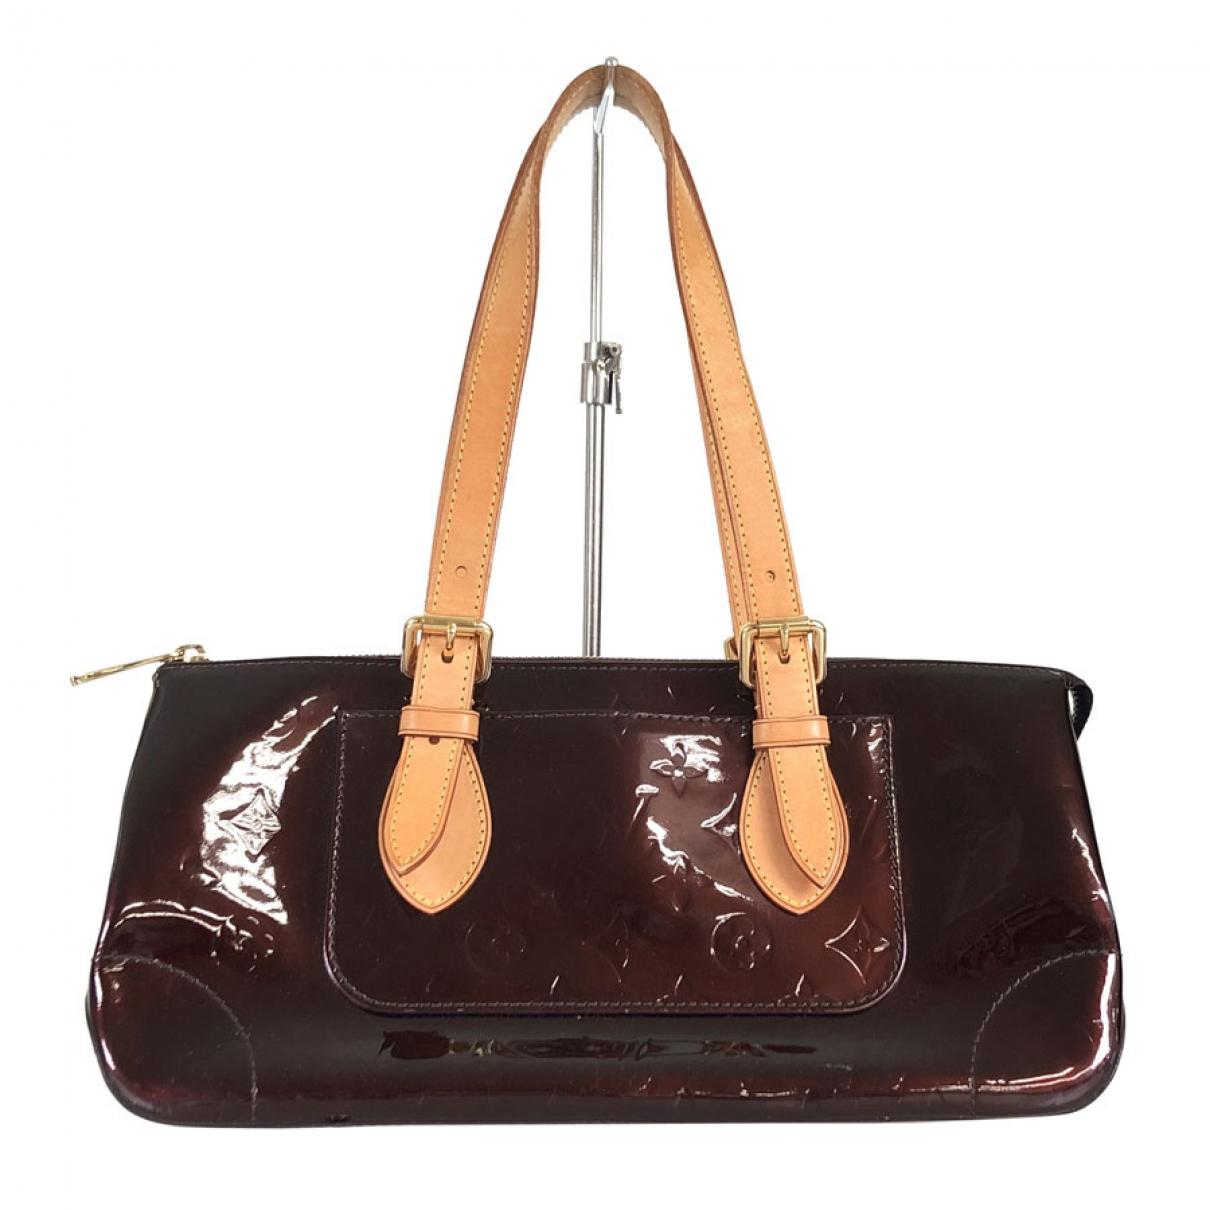 Louis Vuitton Rosewood Purple Patent leather handbag for Women \N